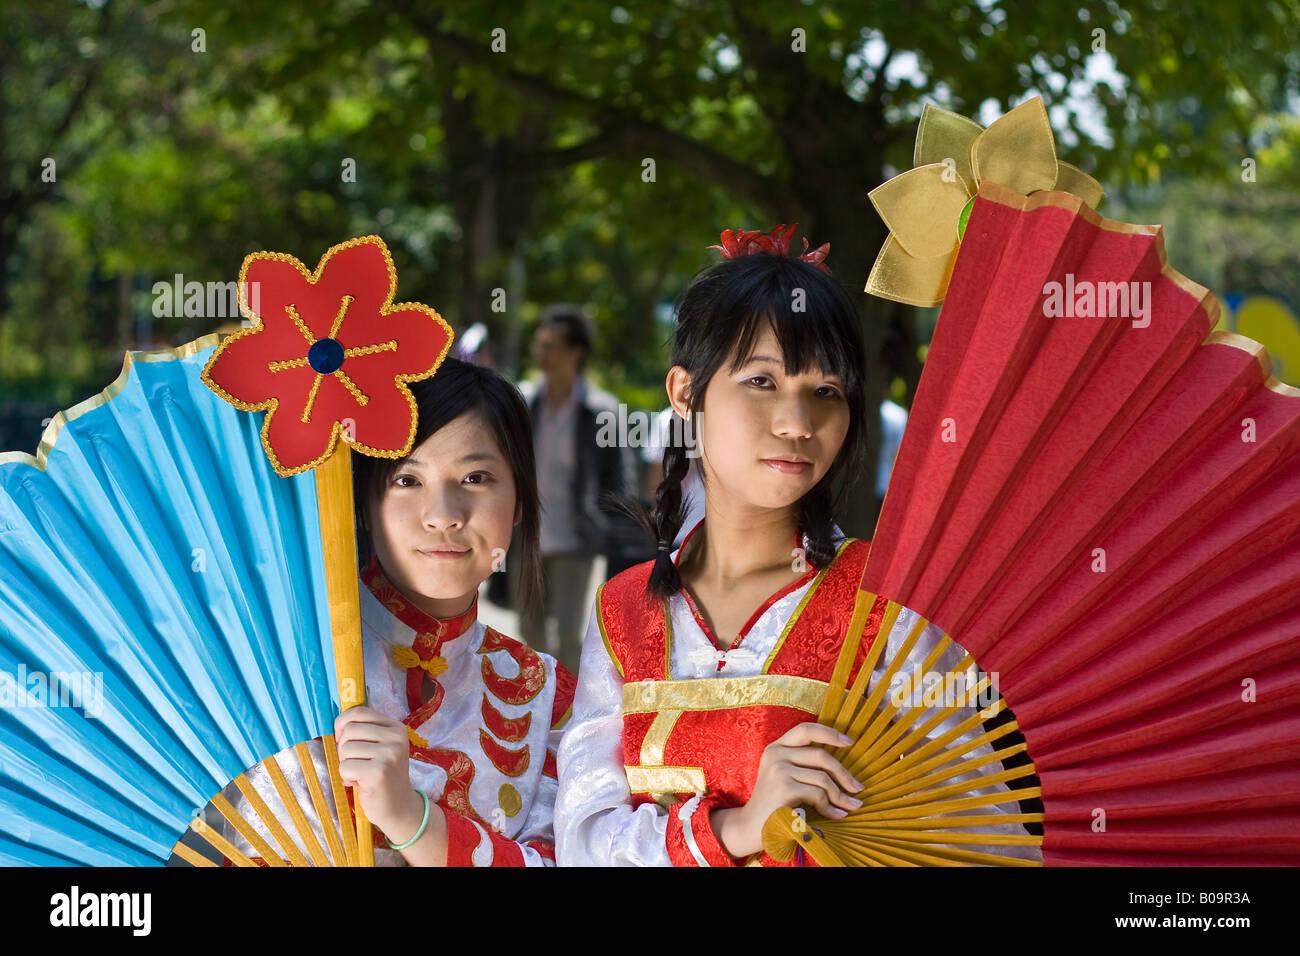 Petit Fancy 8 Cosplay (Costume Play) at National Taiwan University sports center, Taipei, Taiwan. Xiao Qiao (left) - Stock Image